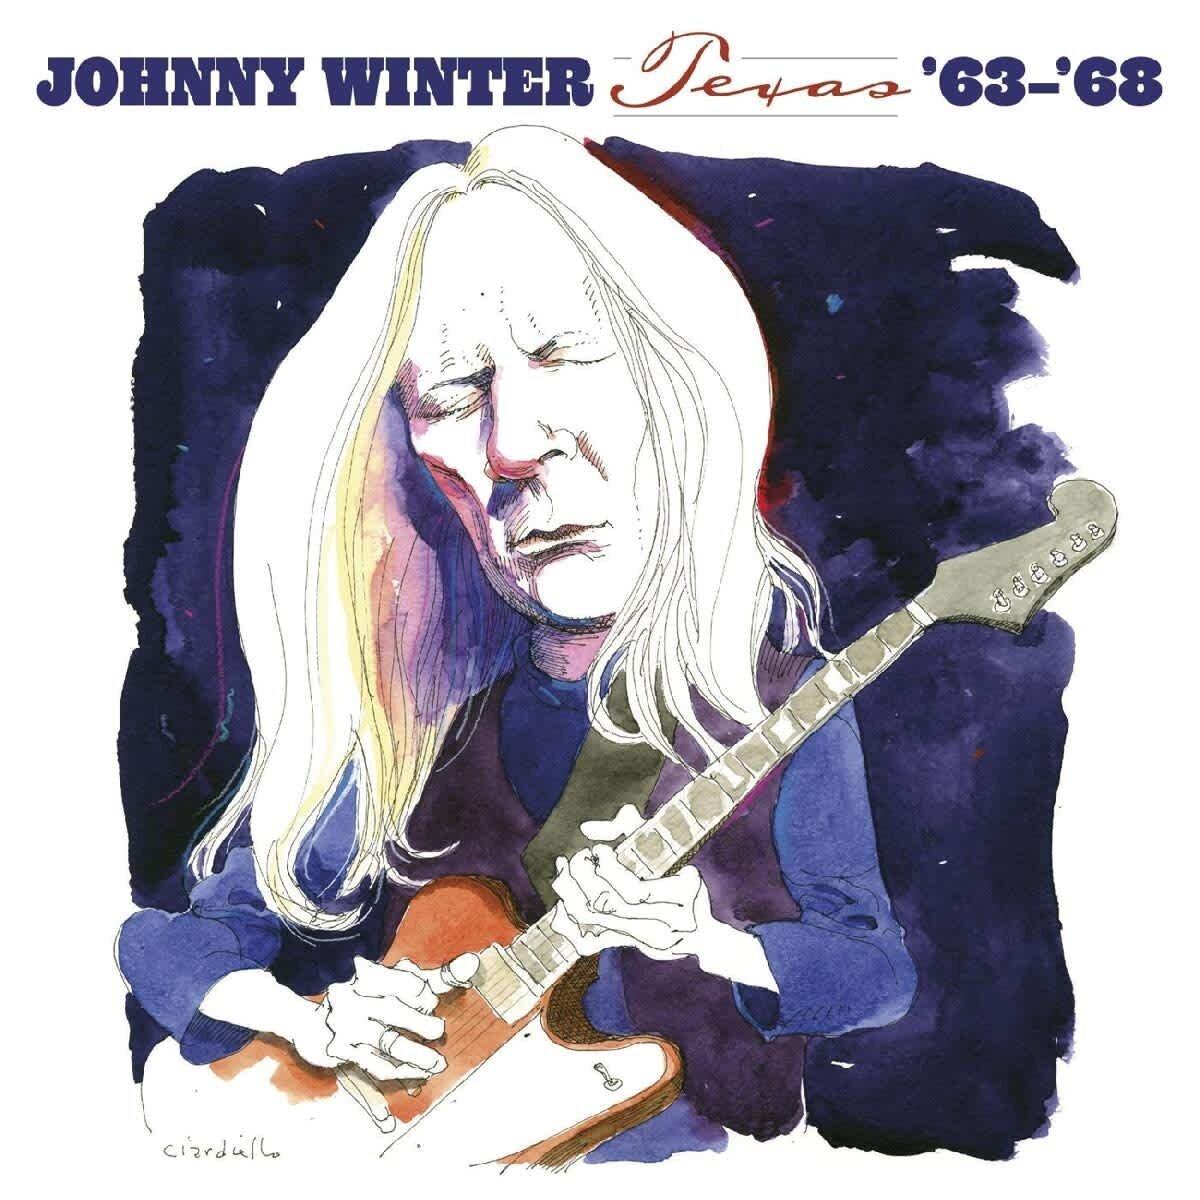 Johnny Winter - Texas '63-'68